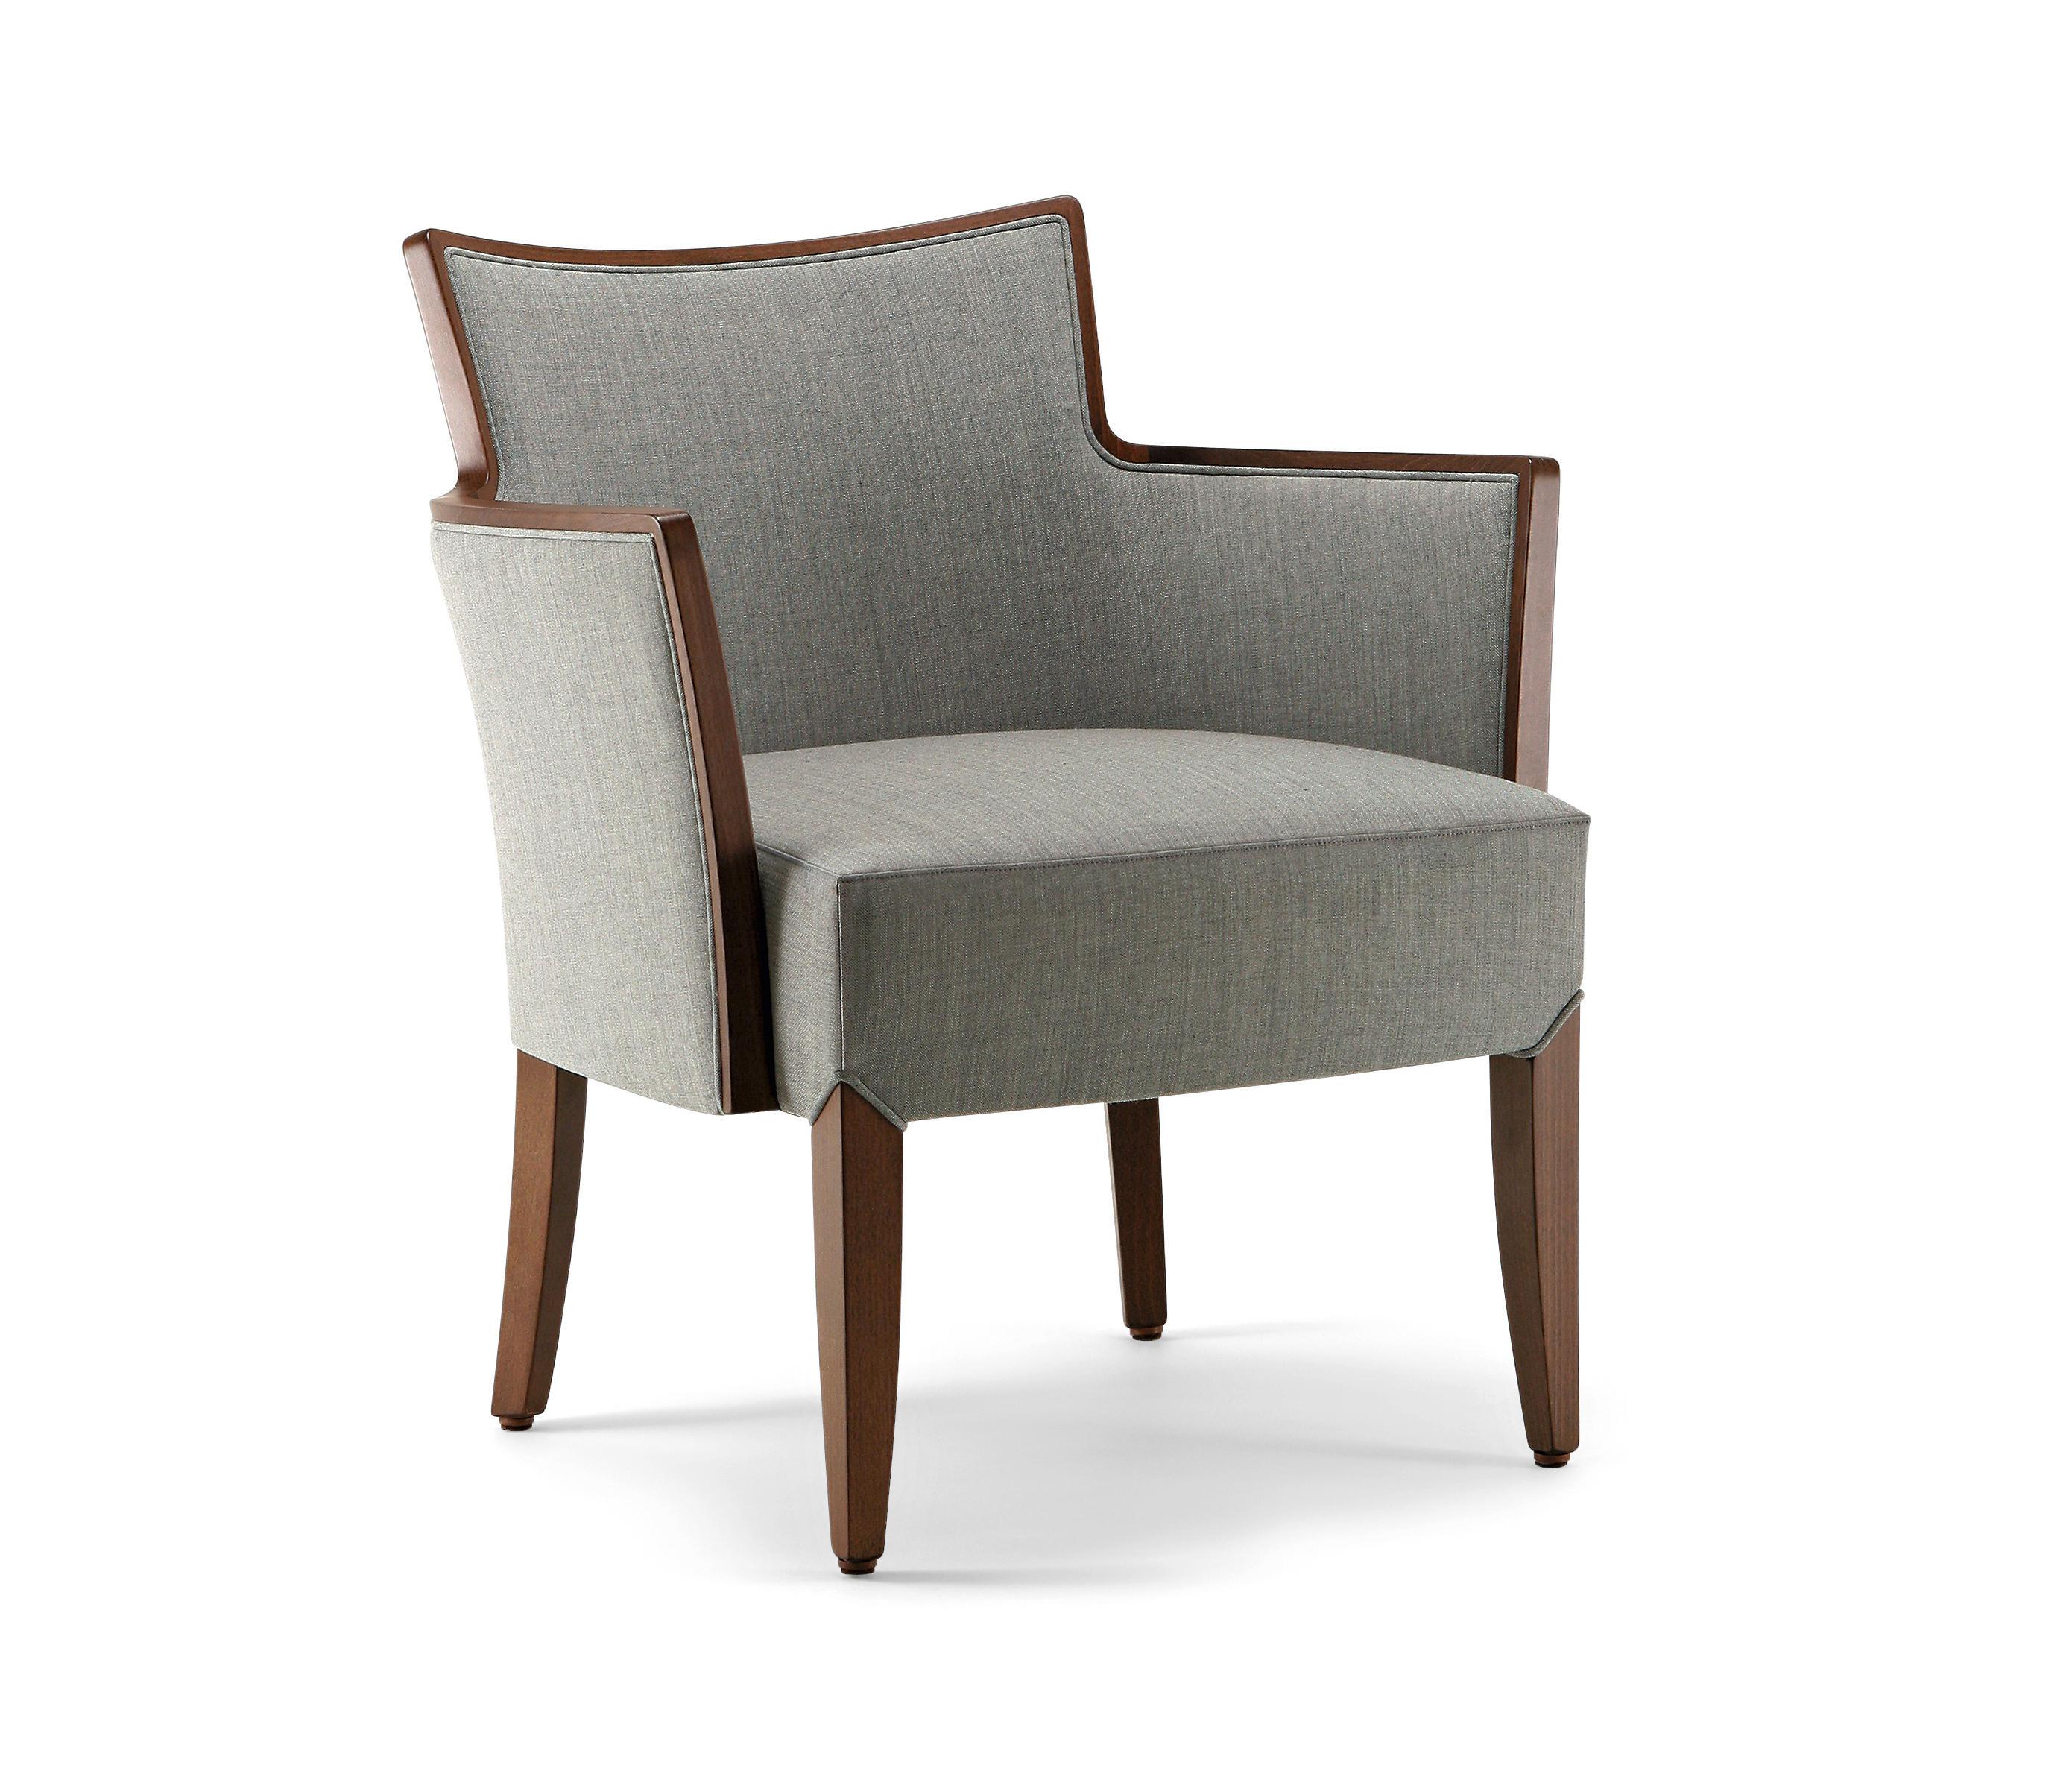 Nobilis poltrona lounge poltrone lounge varaschin for Produttori mobili veneto